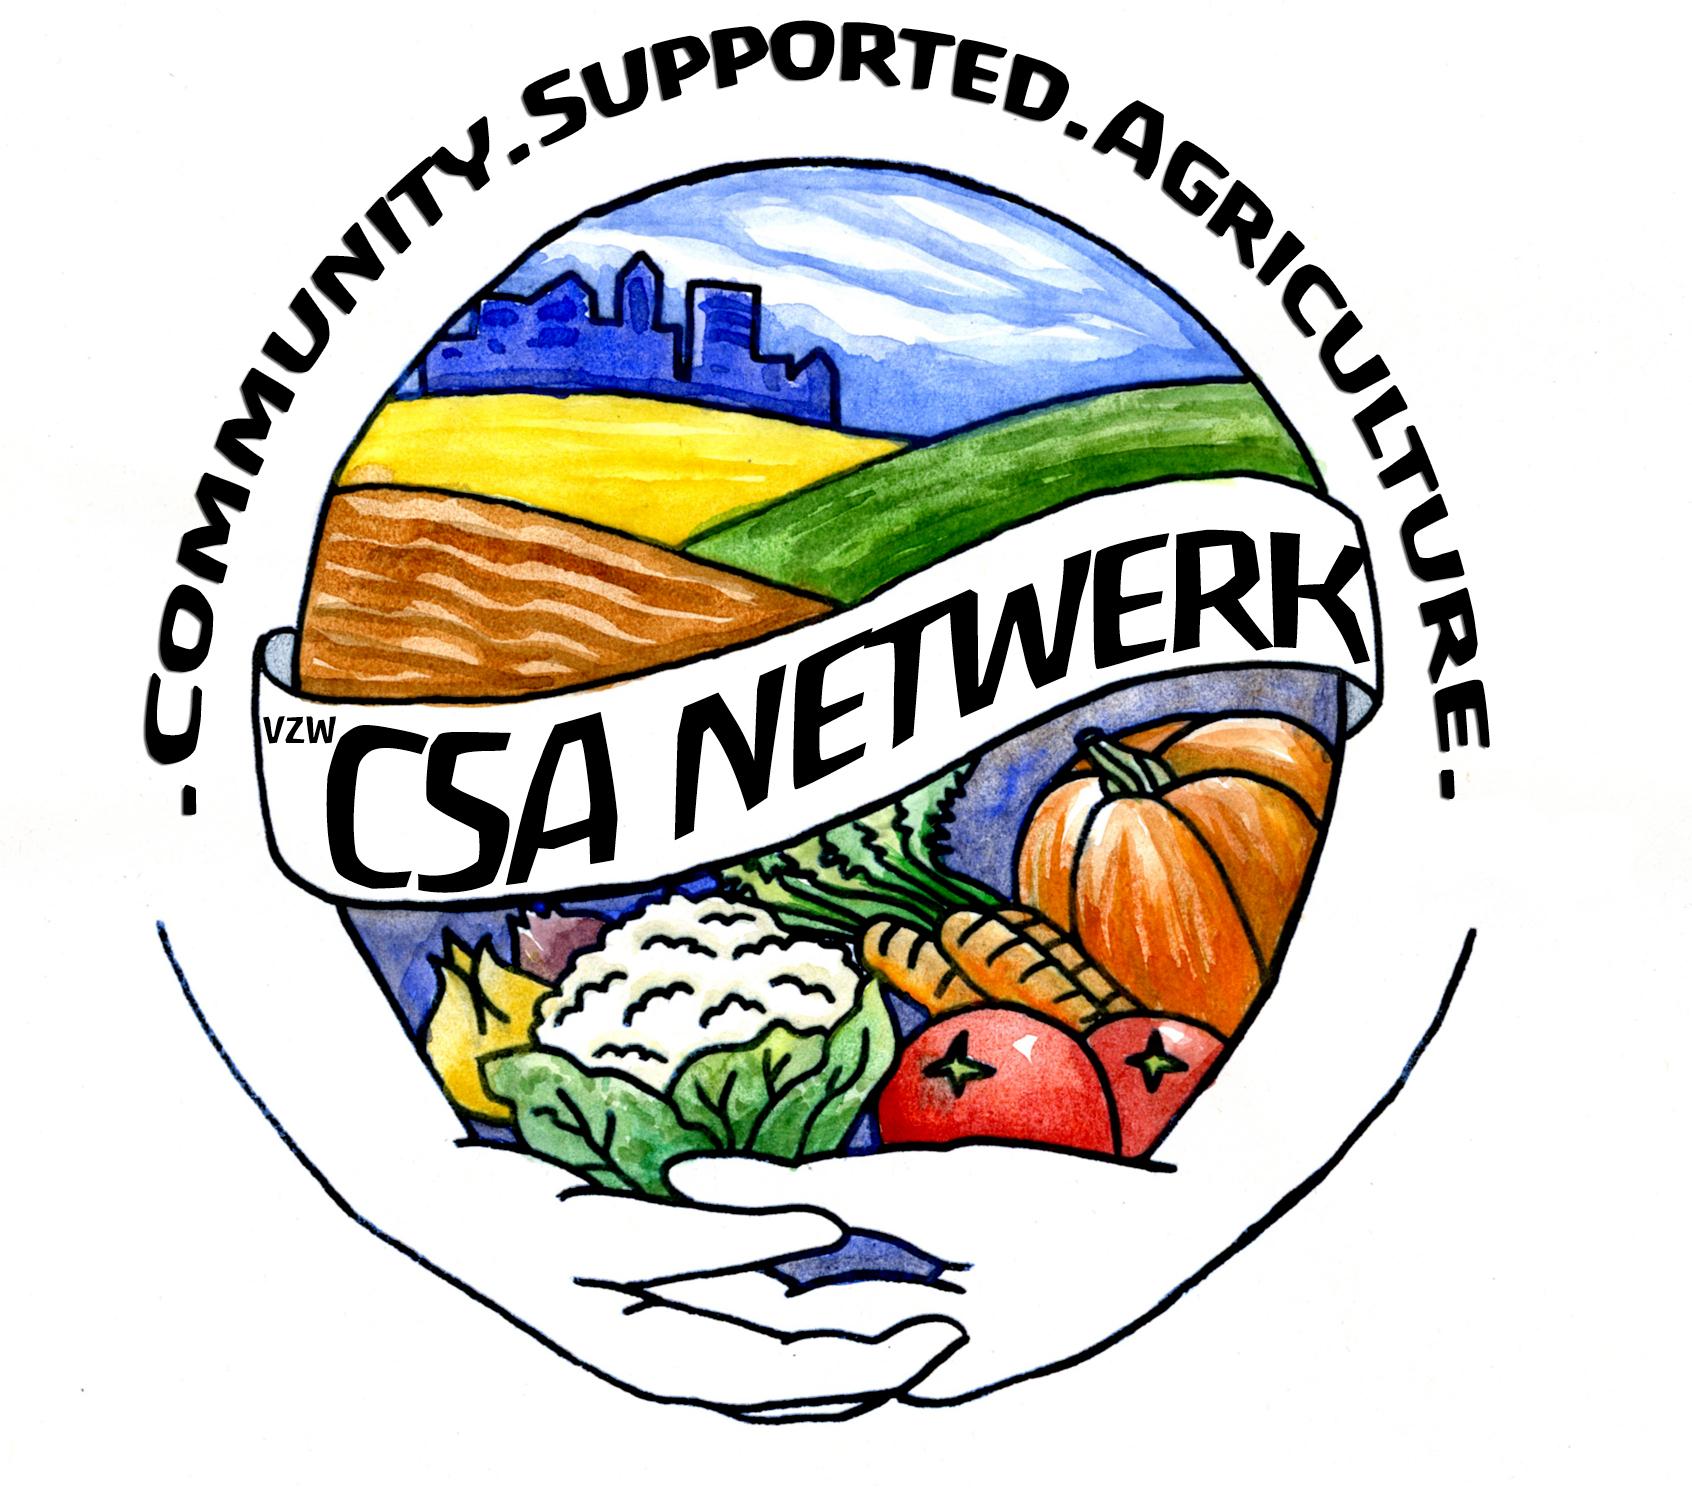 CSA-netwerk logo finaal